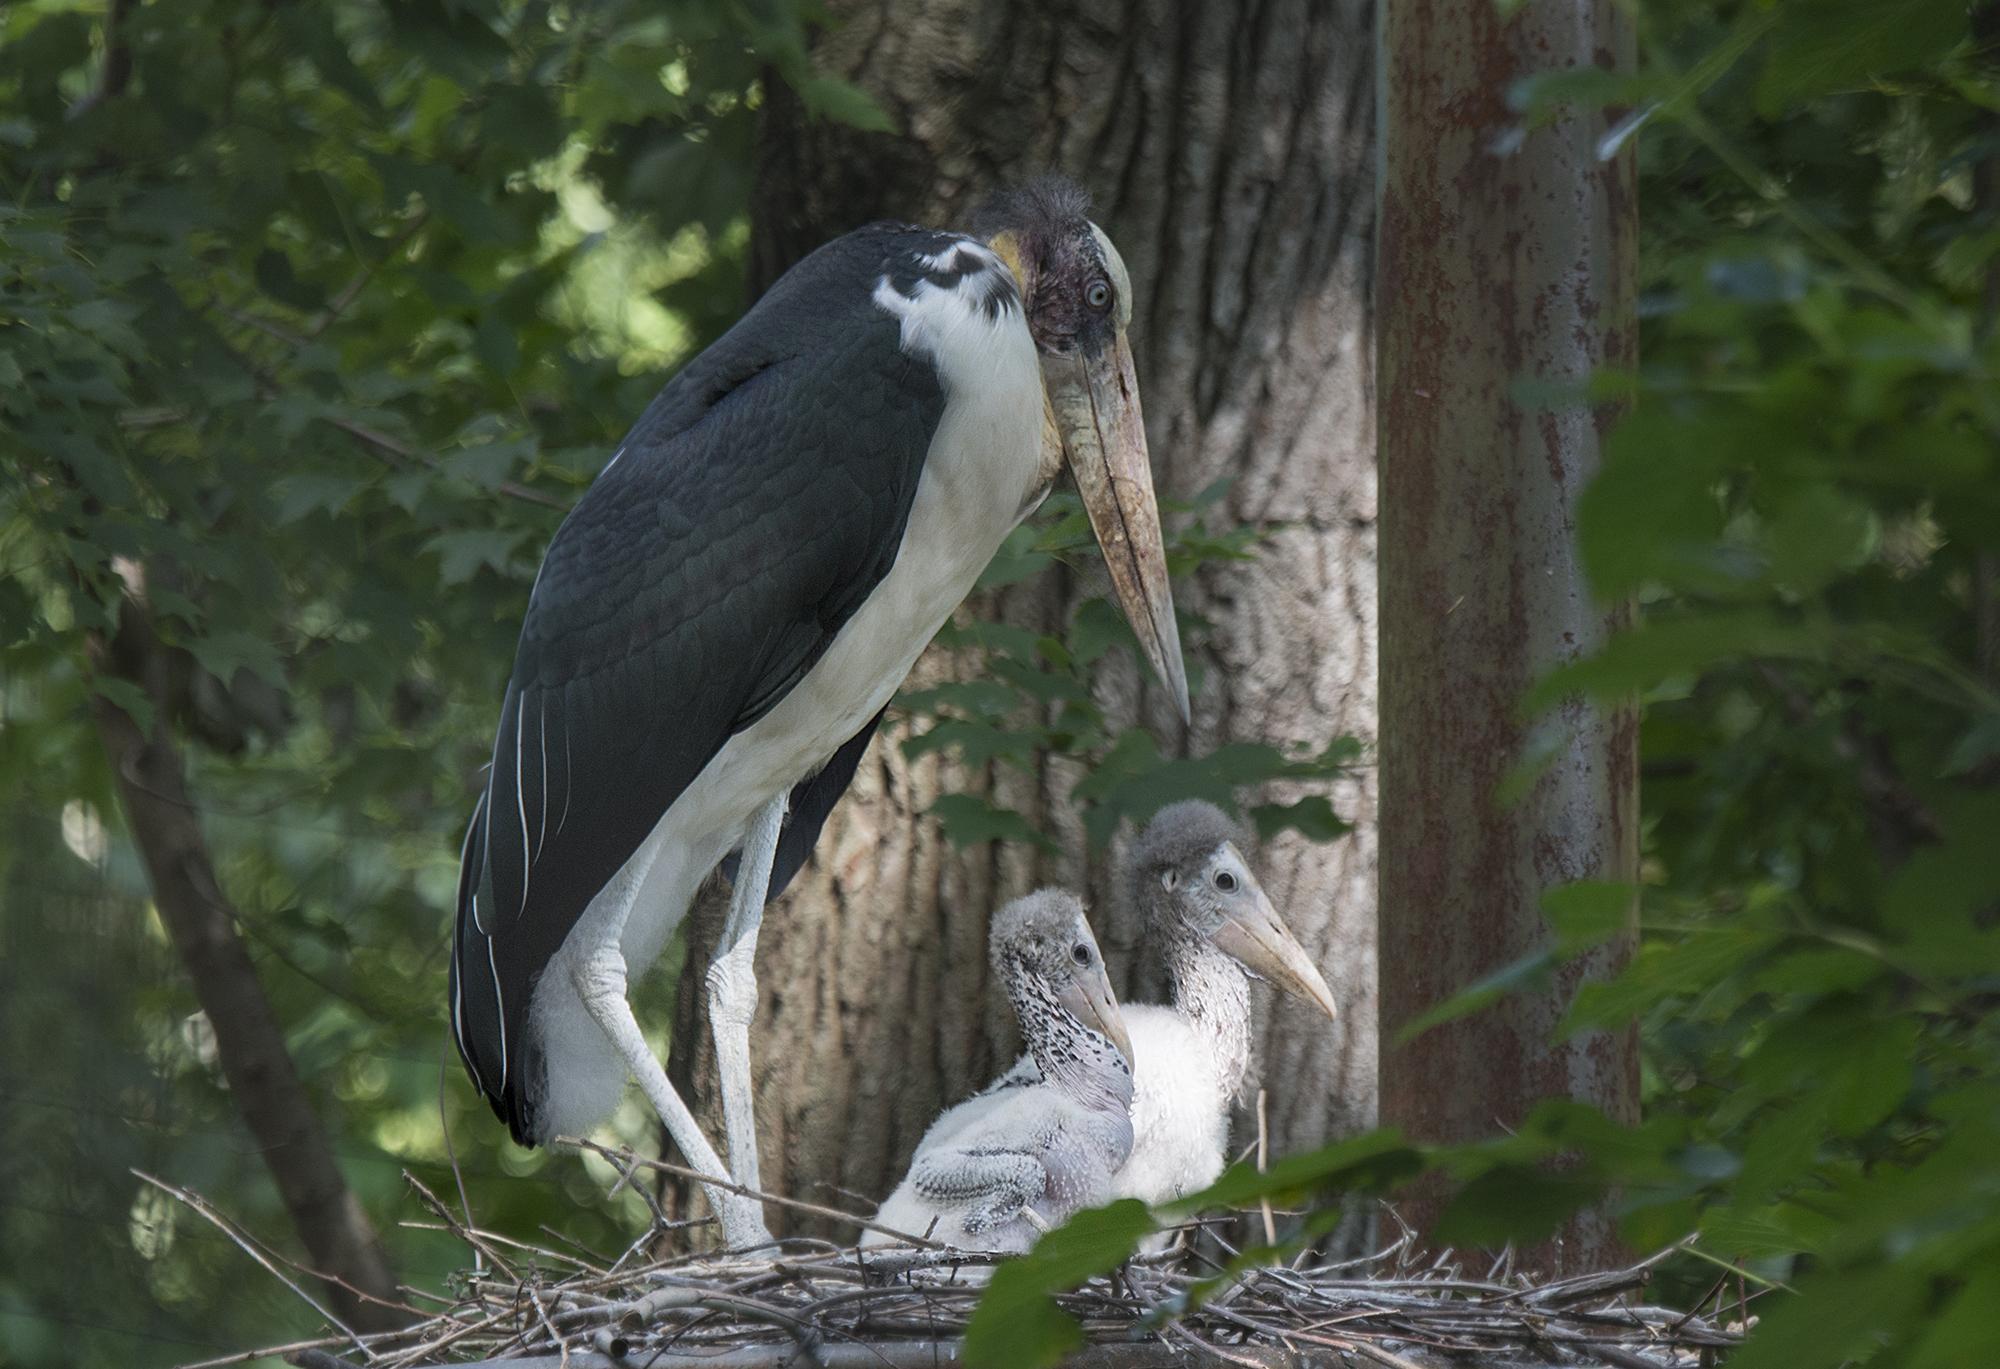 Stork Surrogates – Humans Dropped You Off